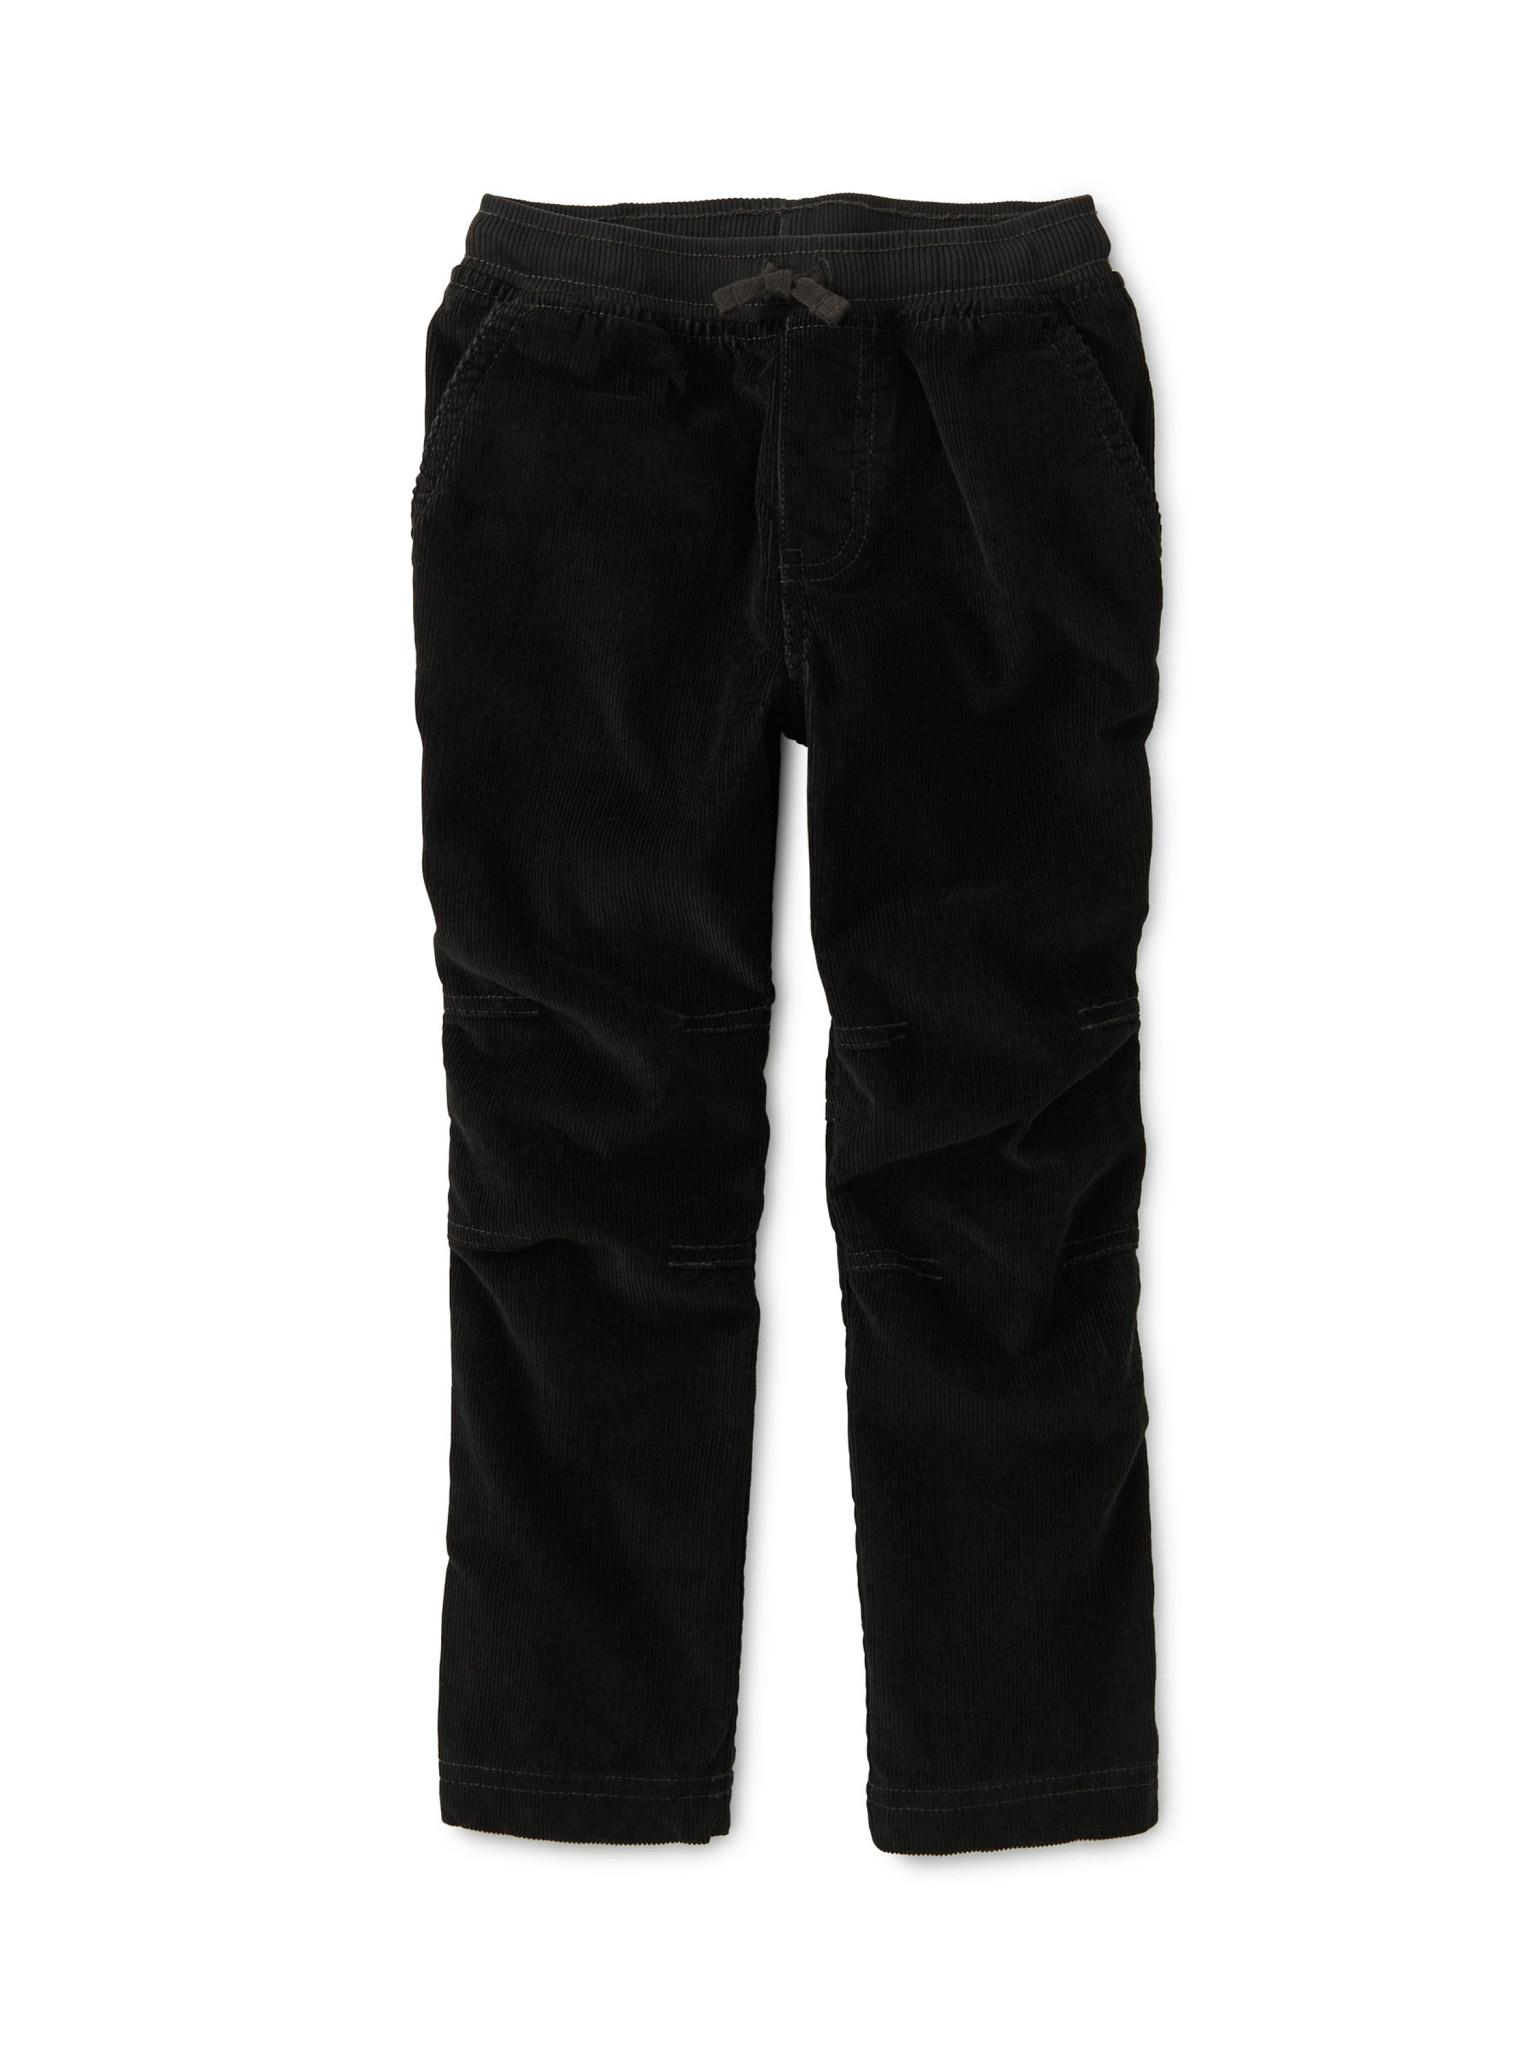 Tea Collection Black Corduroy Easy Pants